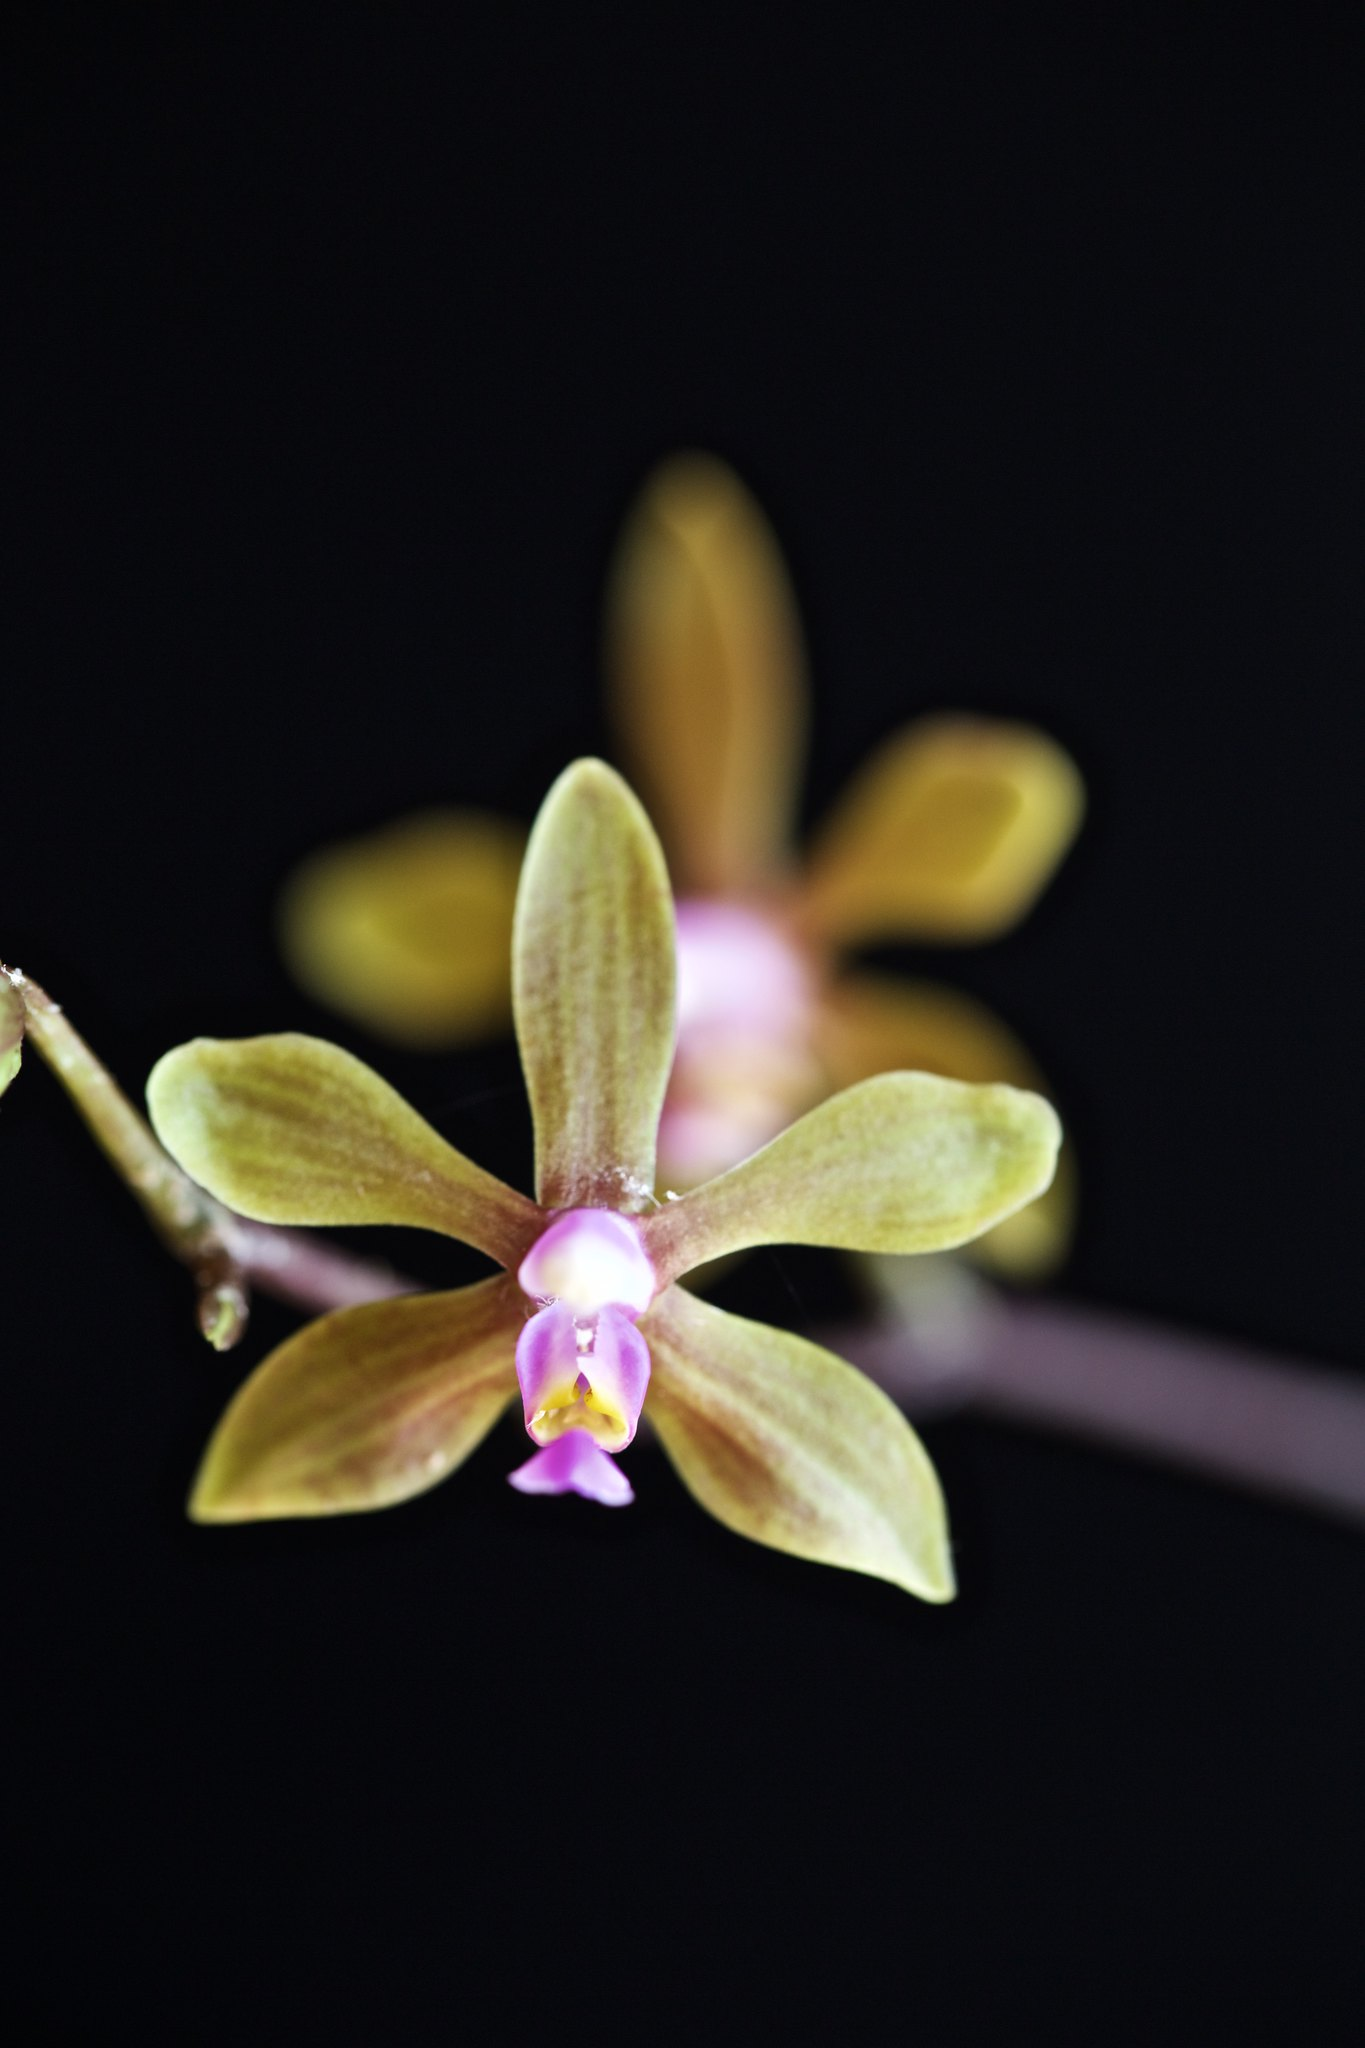 Phalenopsis hainanensis 21824515352_8a6c3af34c_k